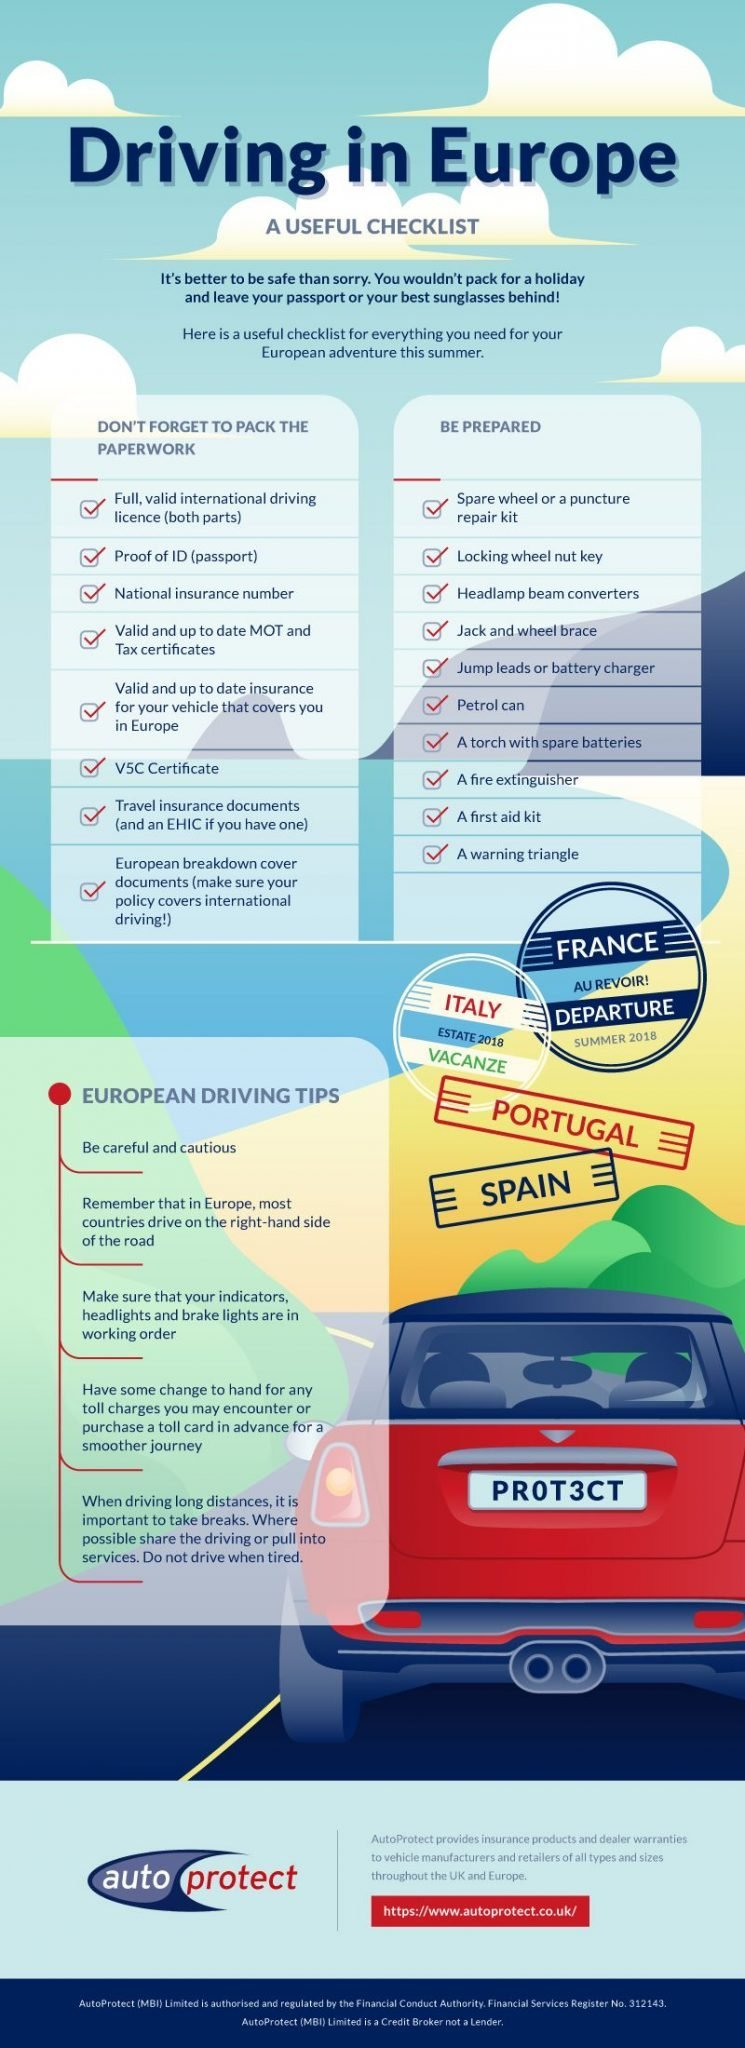 driving, Europe, travel, summer trip